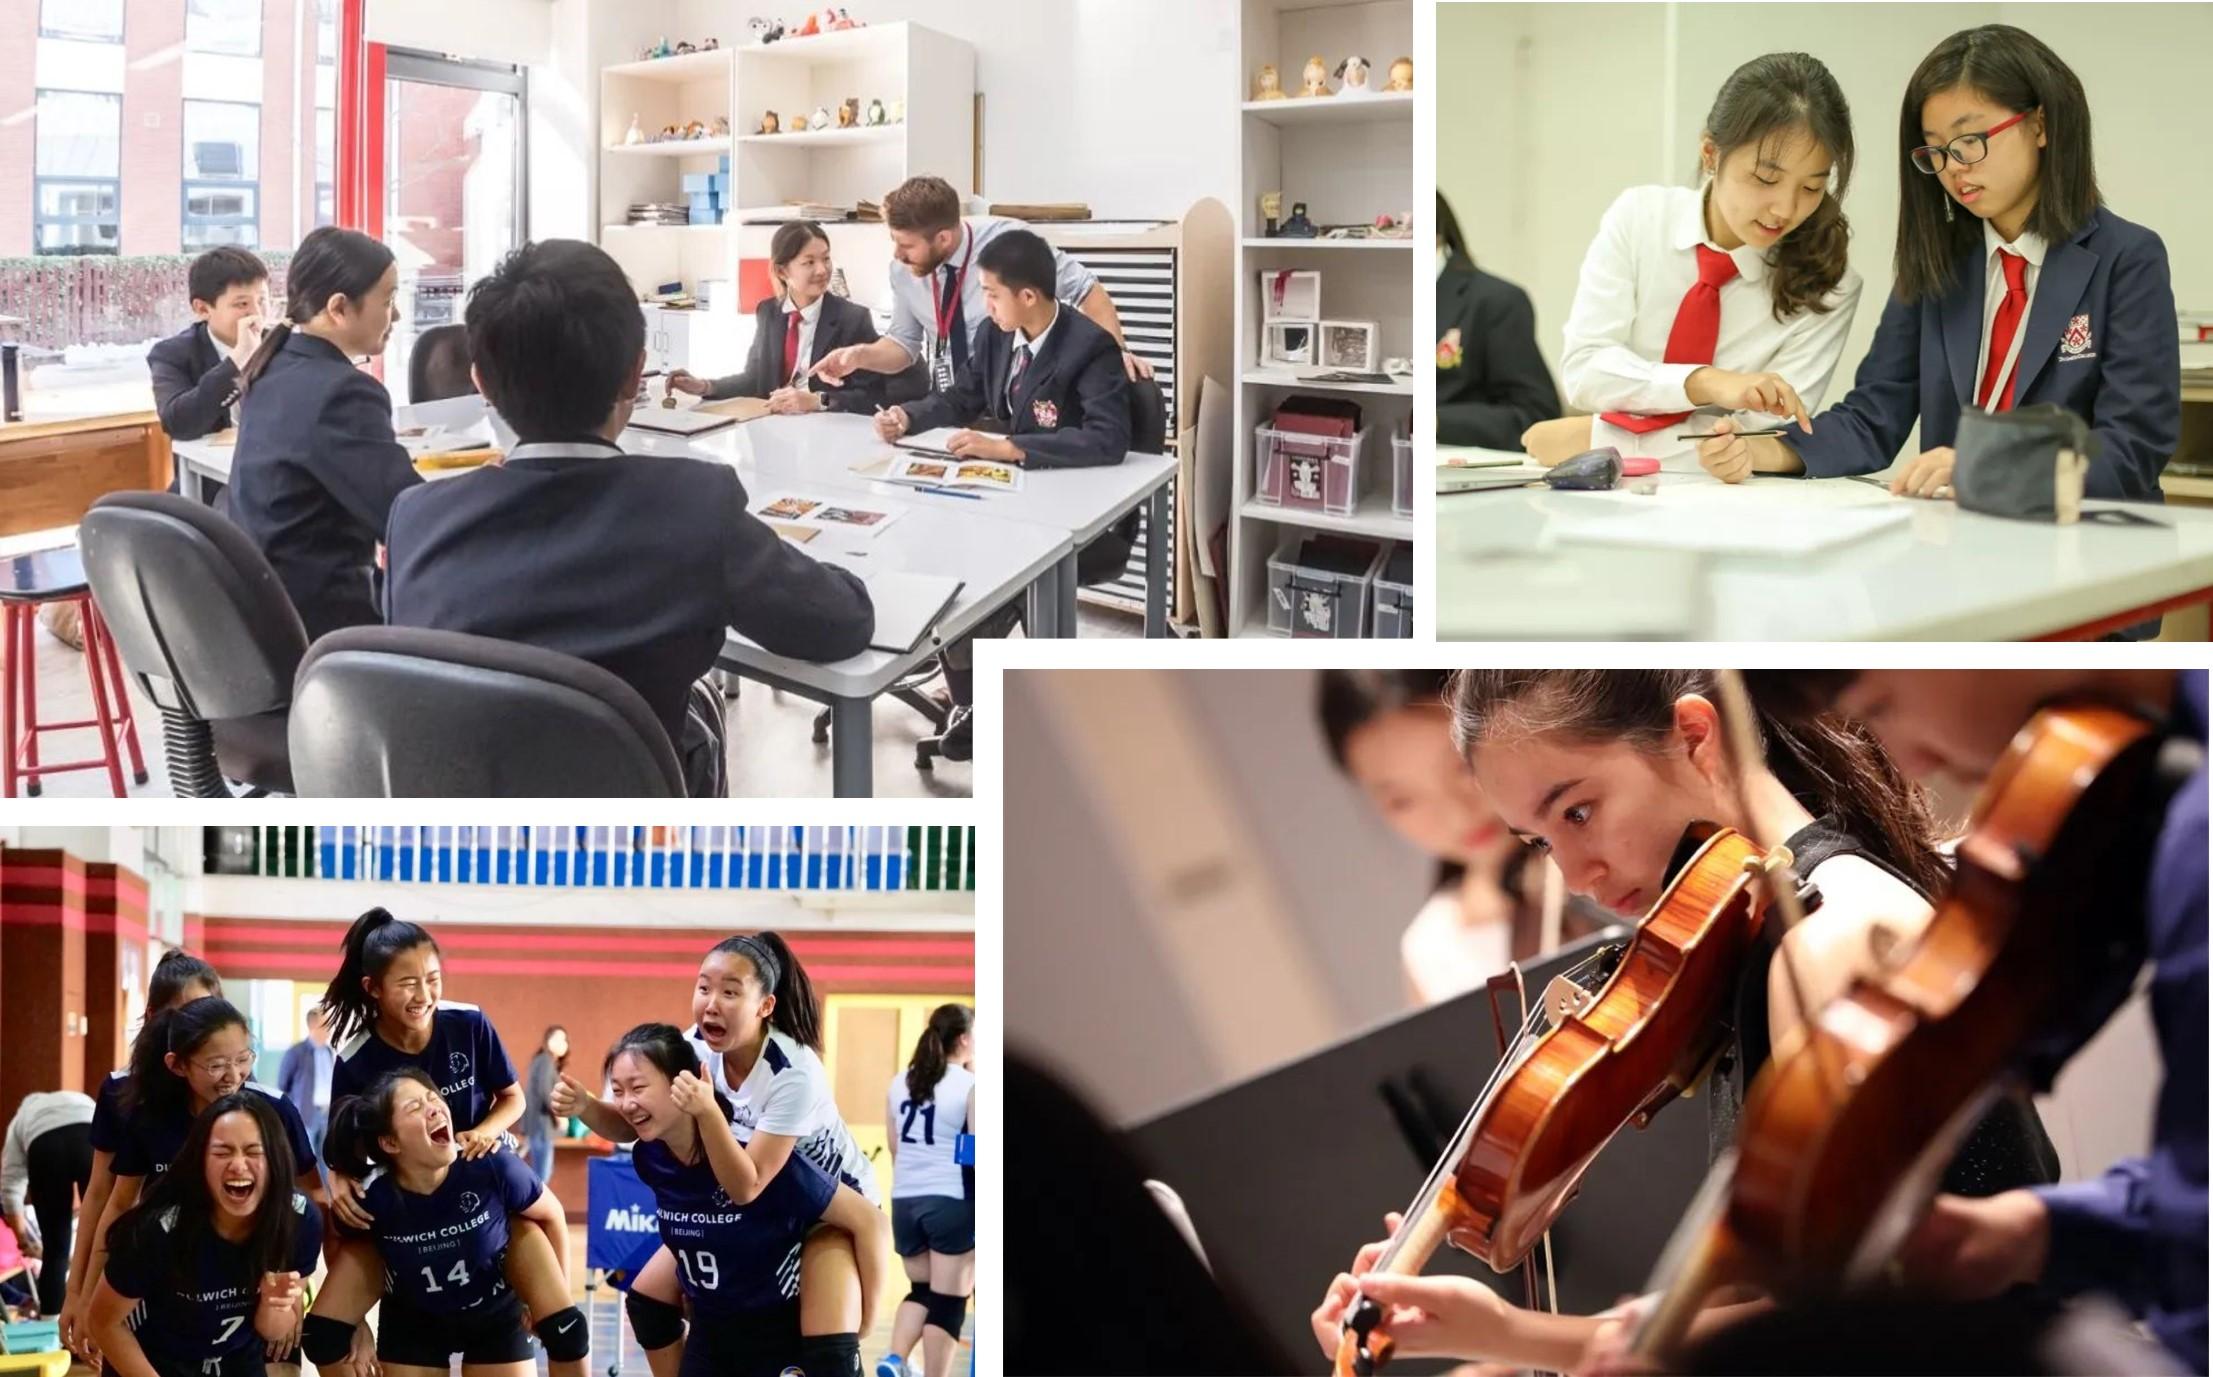 senior-school-students-Dulwich_College_Beijing-20200907-105908-407